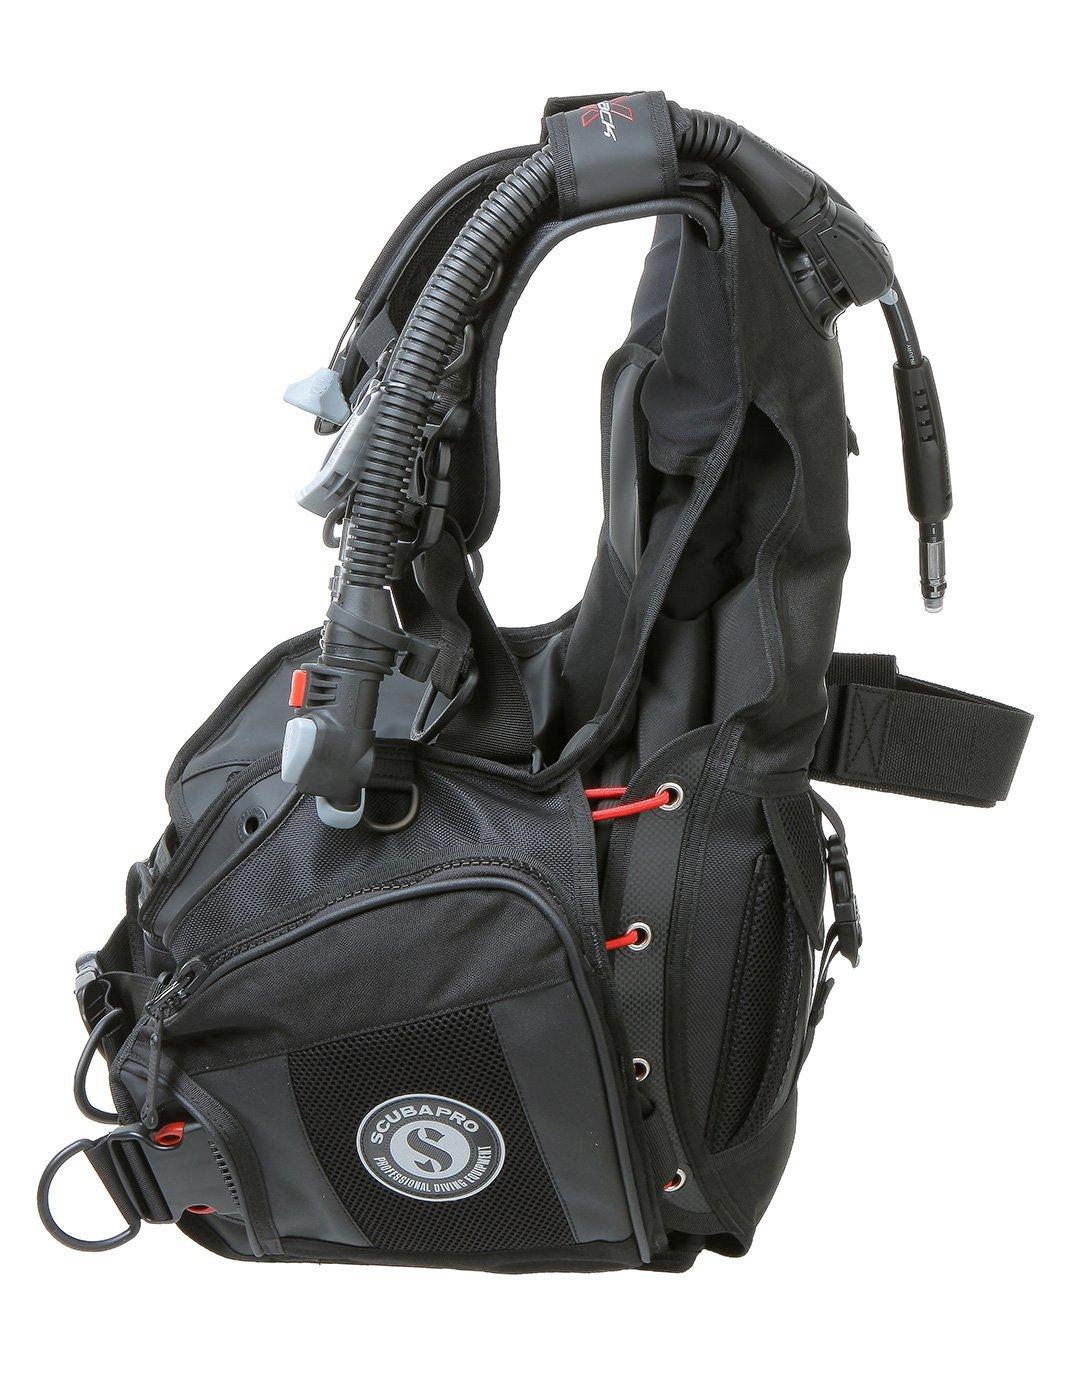 ScubaPro X-Black 5th Gen BCD w/Air2, Black